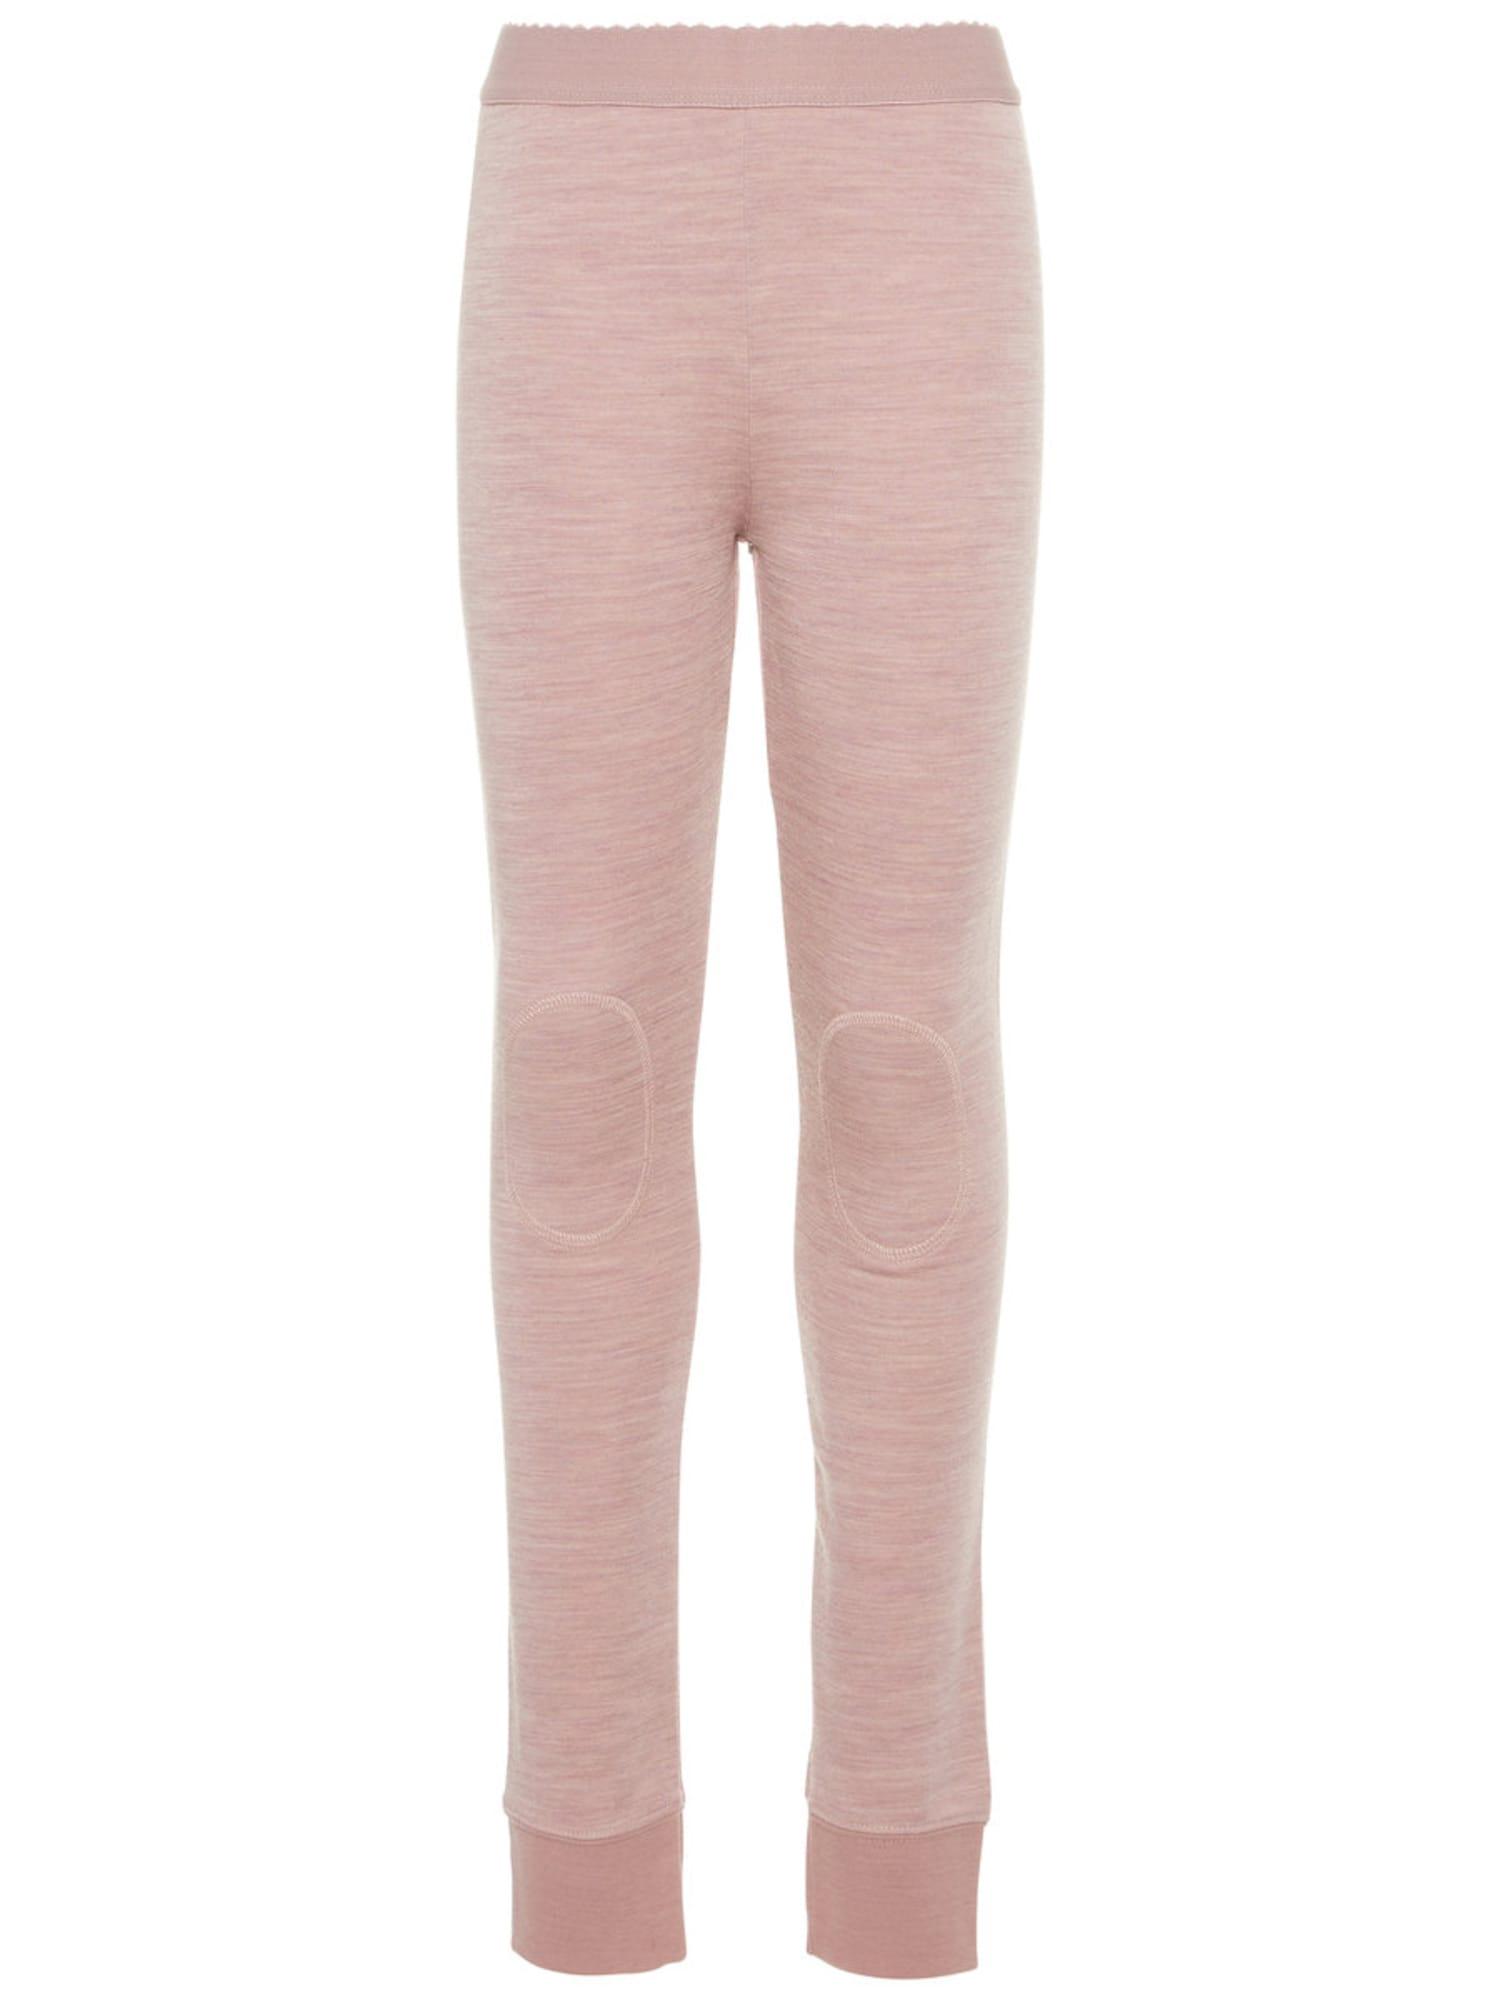 NAME IT Kids Wollen-katoenen Legging Dames Roze